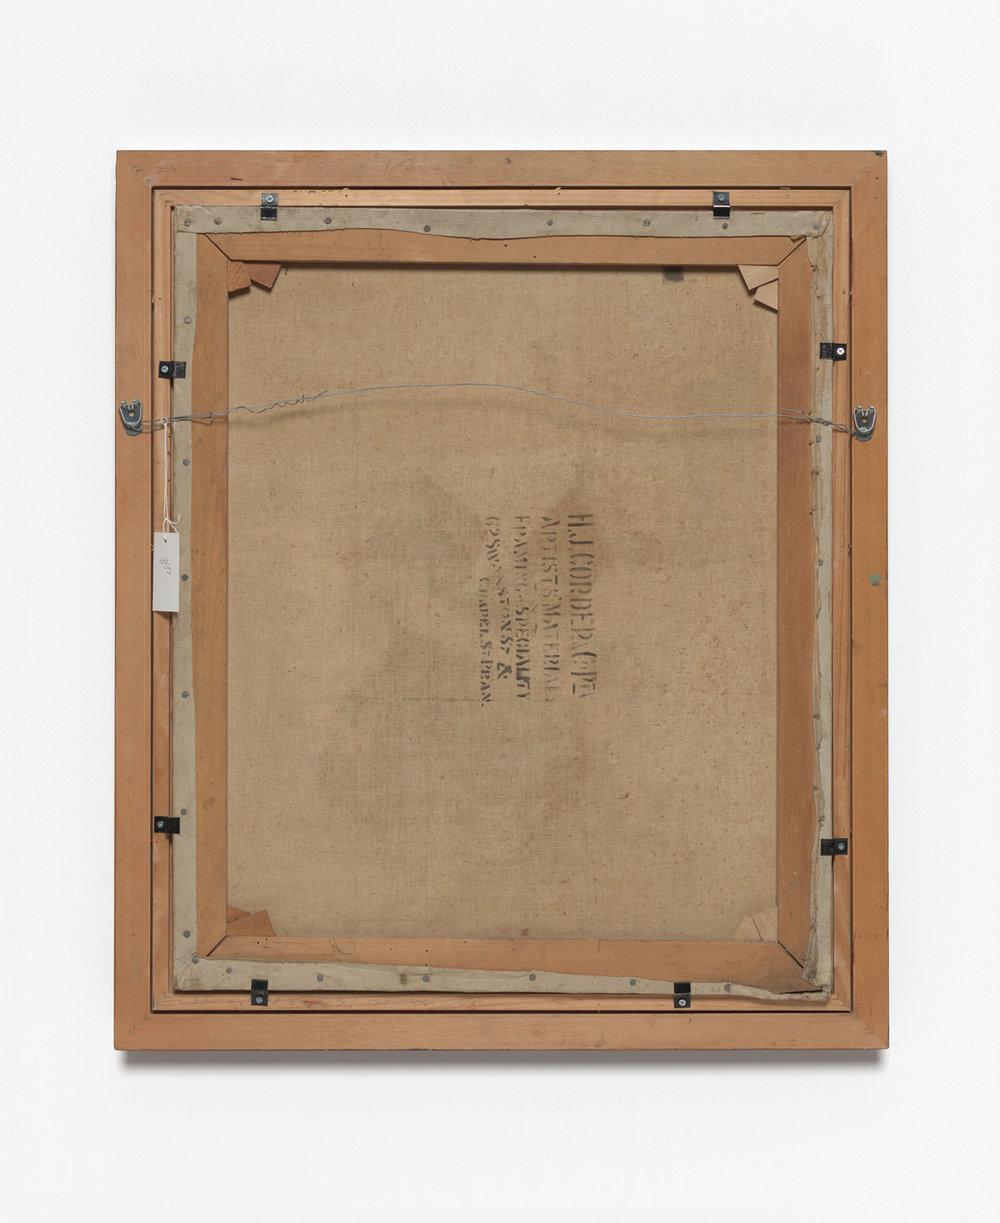 Back of Bale's Self Portrait, Siri Hayes, 2017, Inkjet on cotton rag art paper, 98 x 118cm